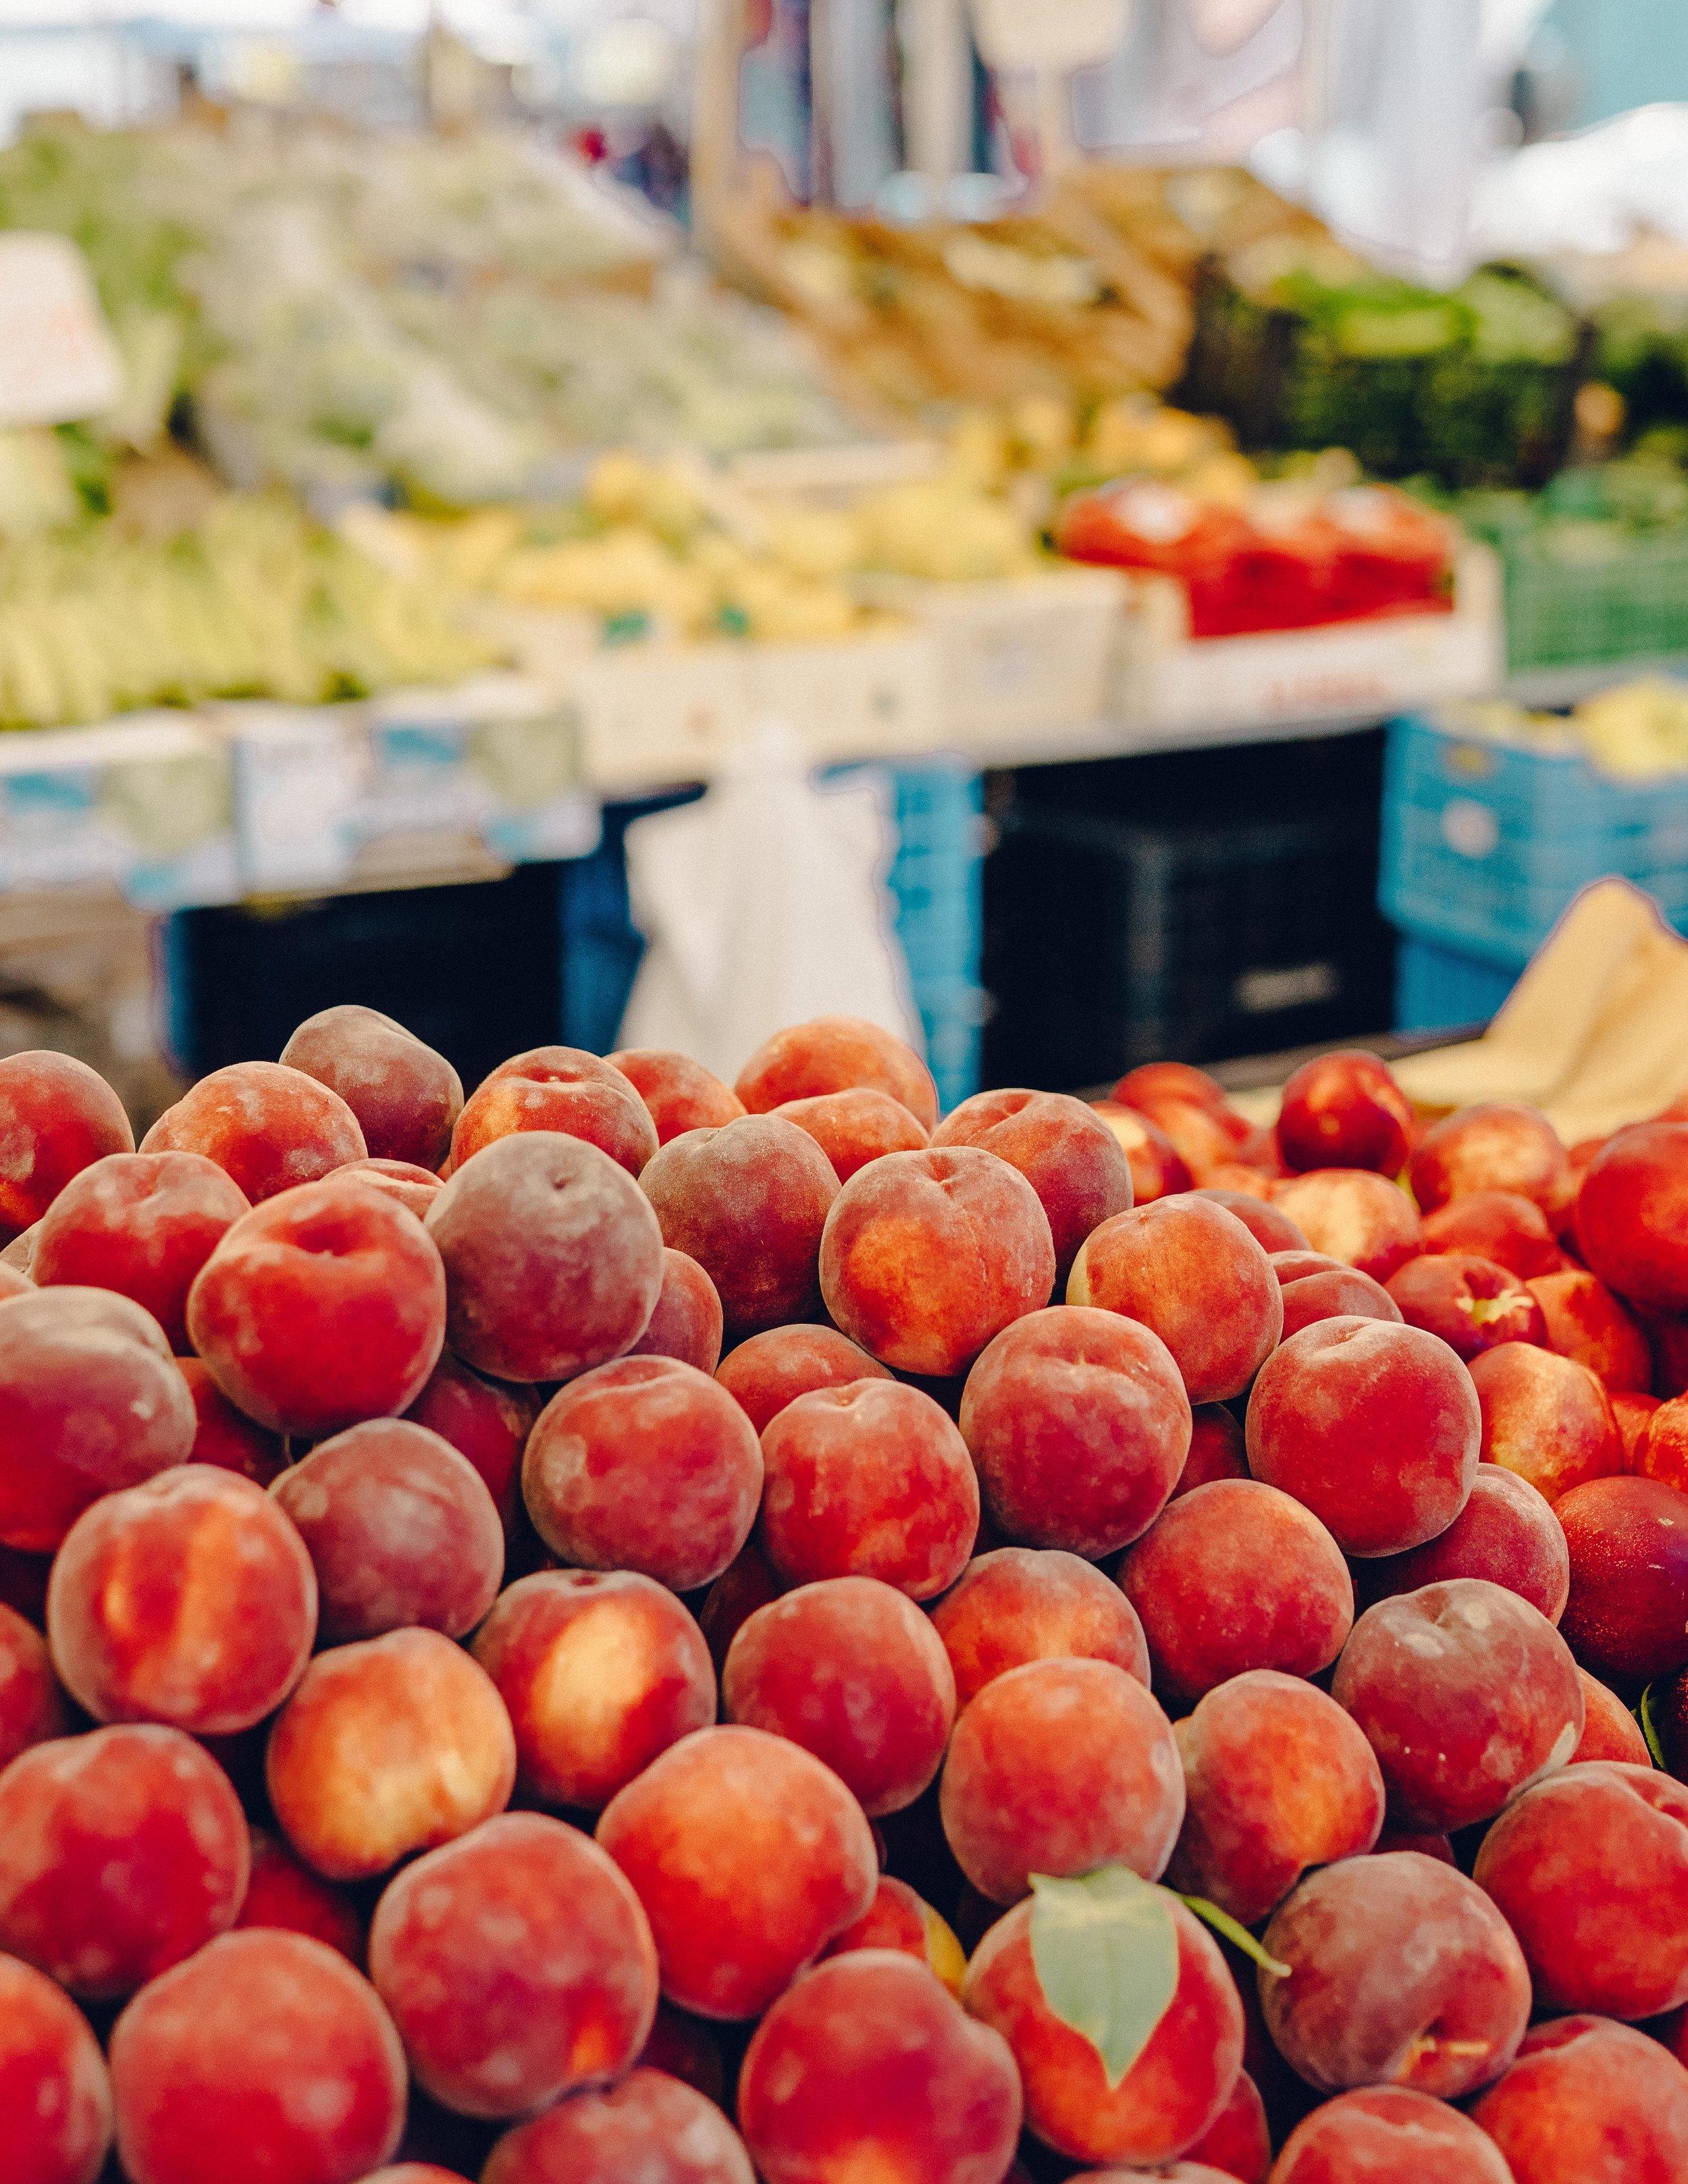 ASROSENVINGE_Roadtrip_Italy_Puglia_Martinafranca_Market_Fruits-07184.jpg